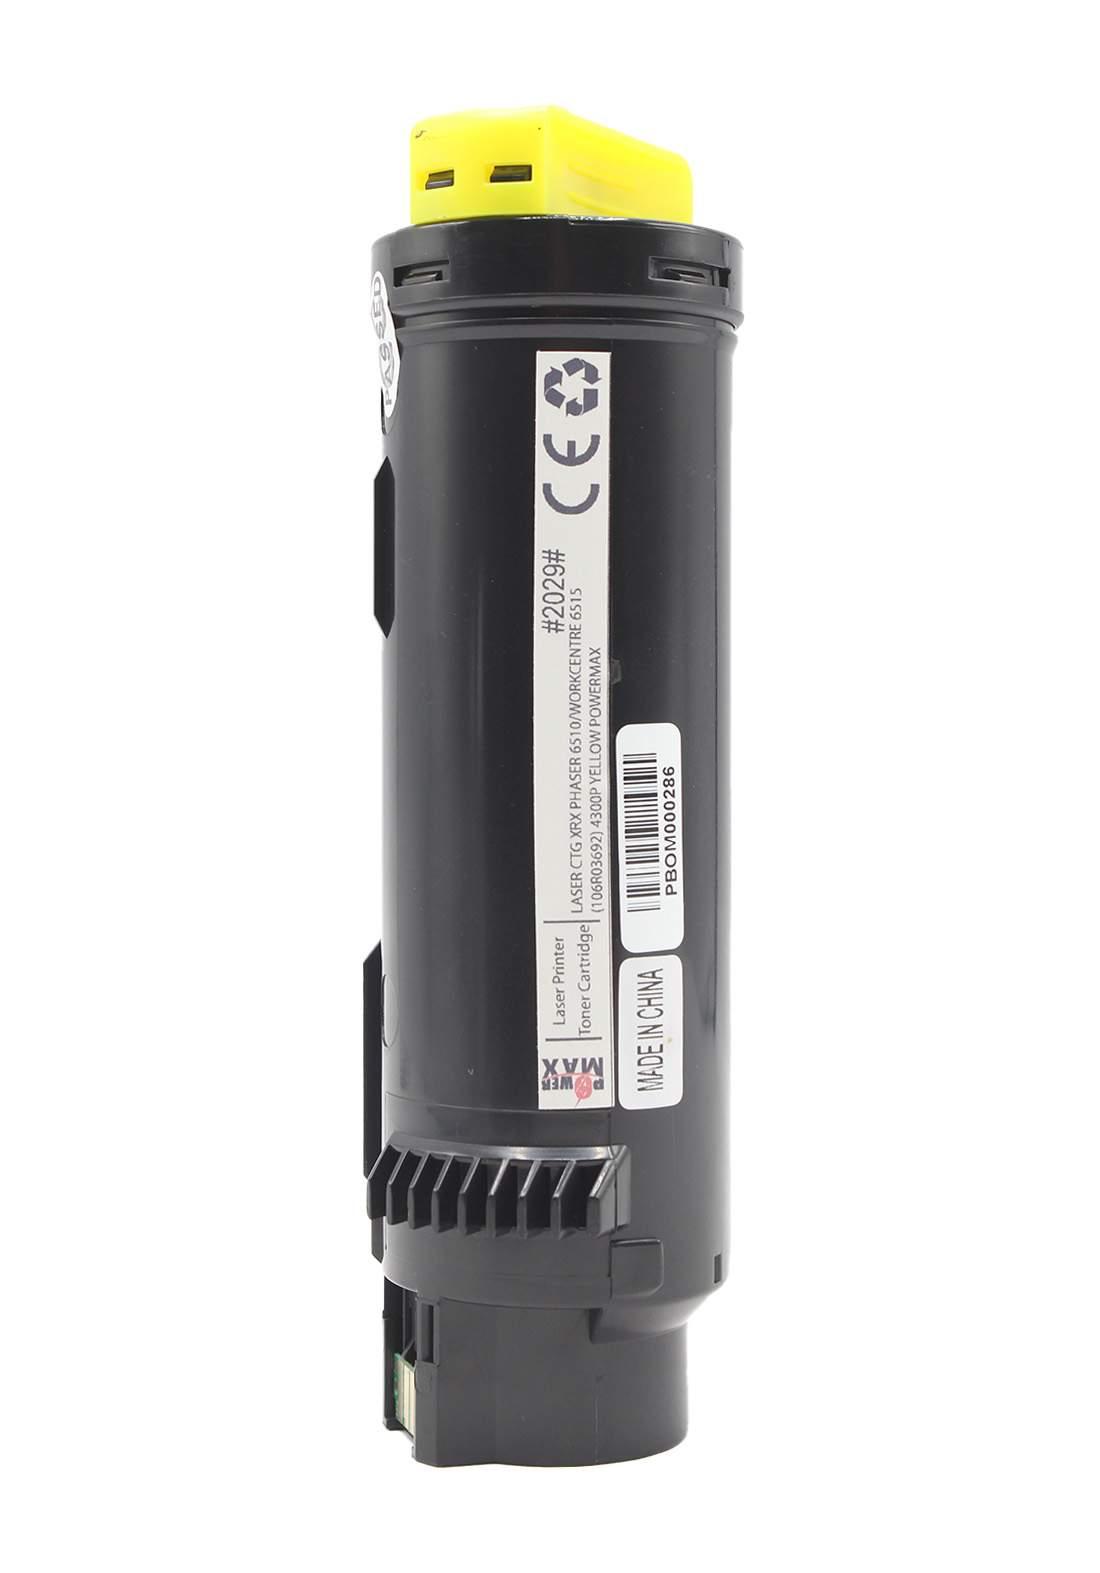 Power Max CTG Xerox Phaser 6510/ Workcentre 6515 (106R03692) 4300P Laser Printer Toner Cartridge خرطوشة حبر